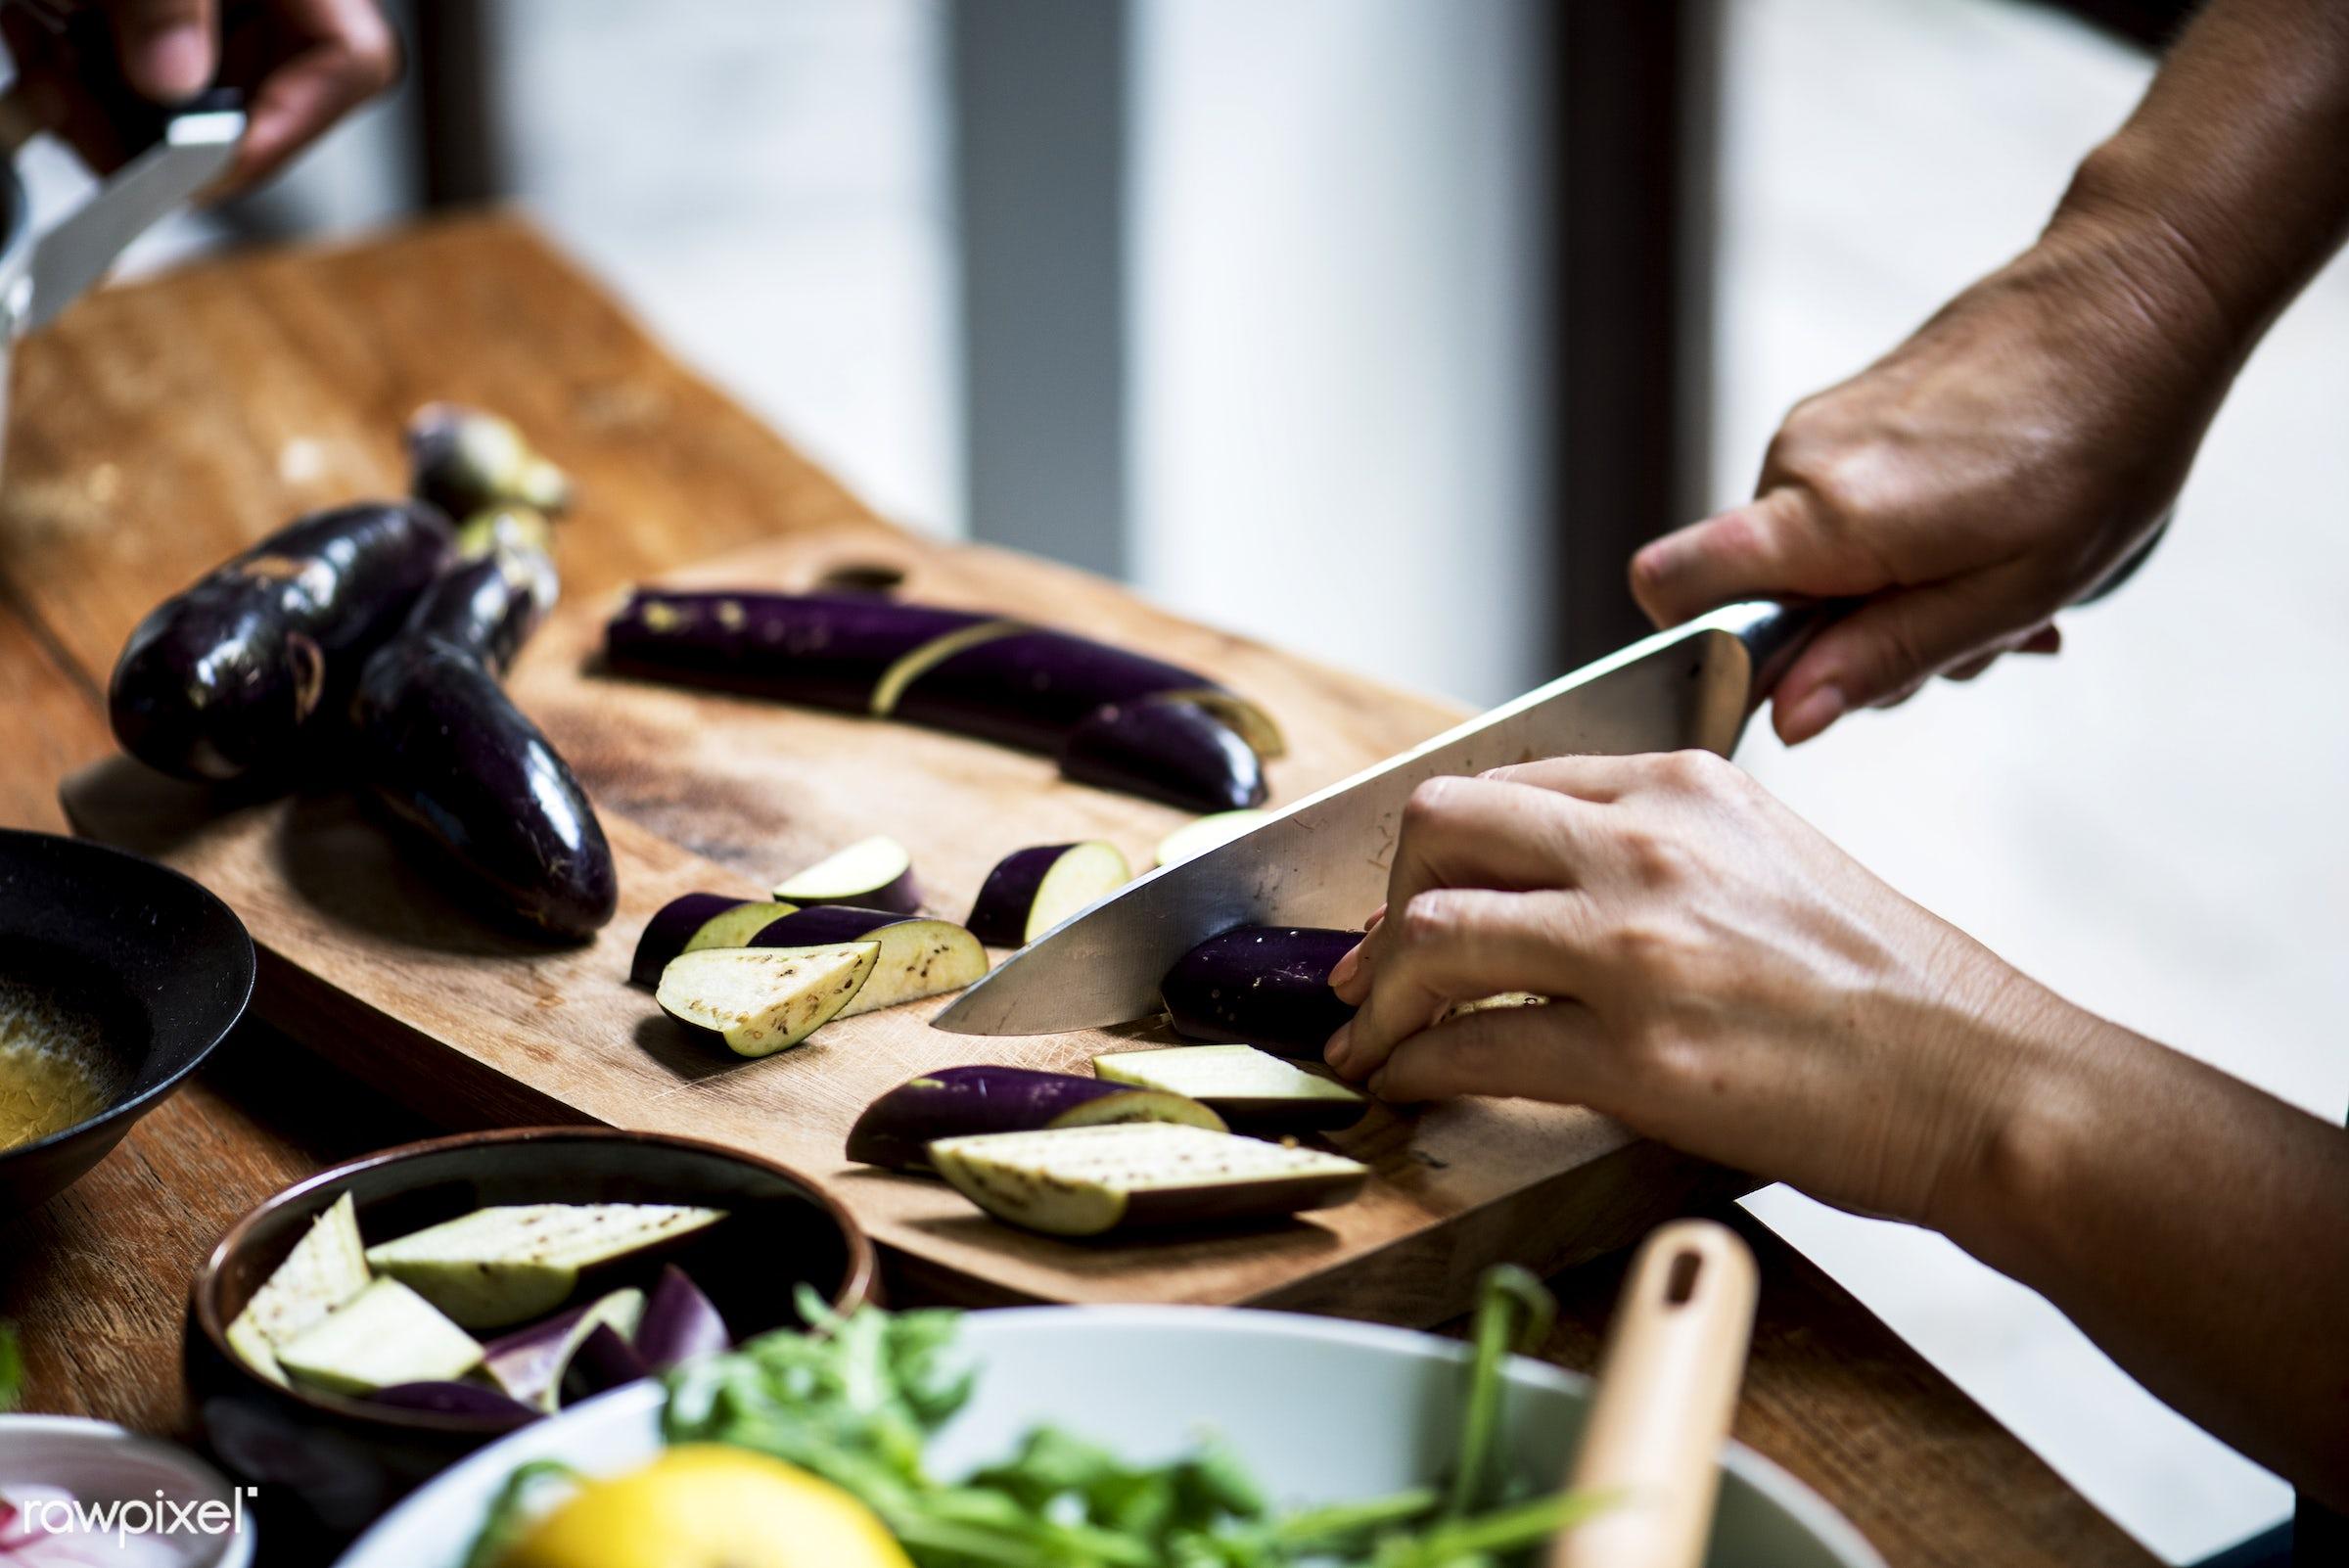 raw, diverse, chopping board, eggplant, farm, ingredients, nature, farmer, fresh, hands, products, closeup, knife, cut board...